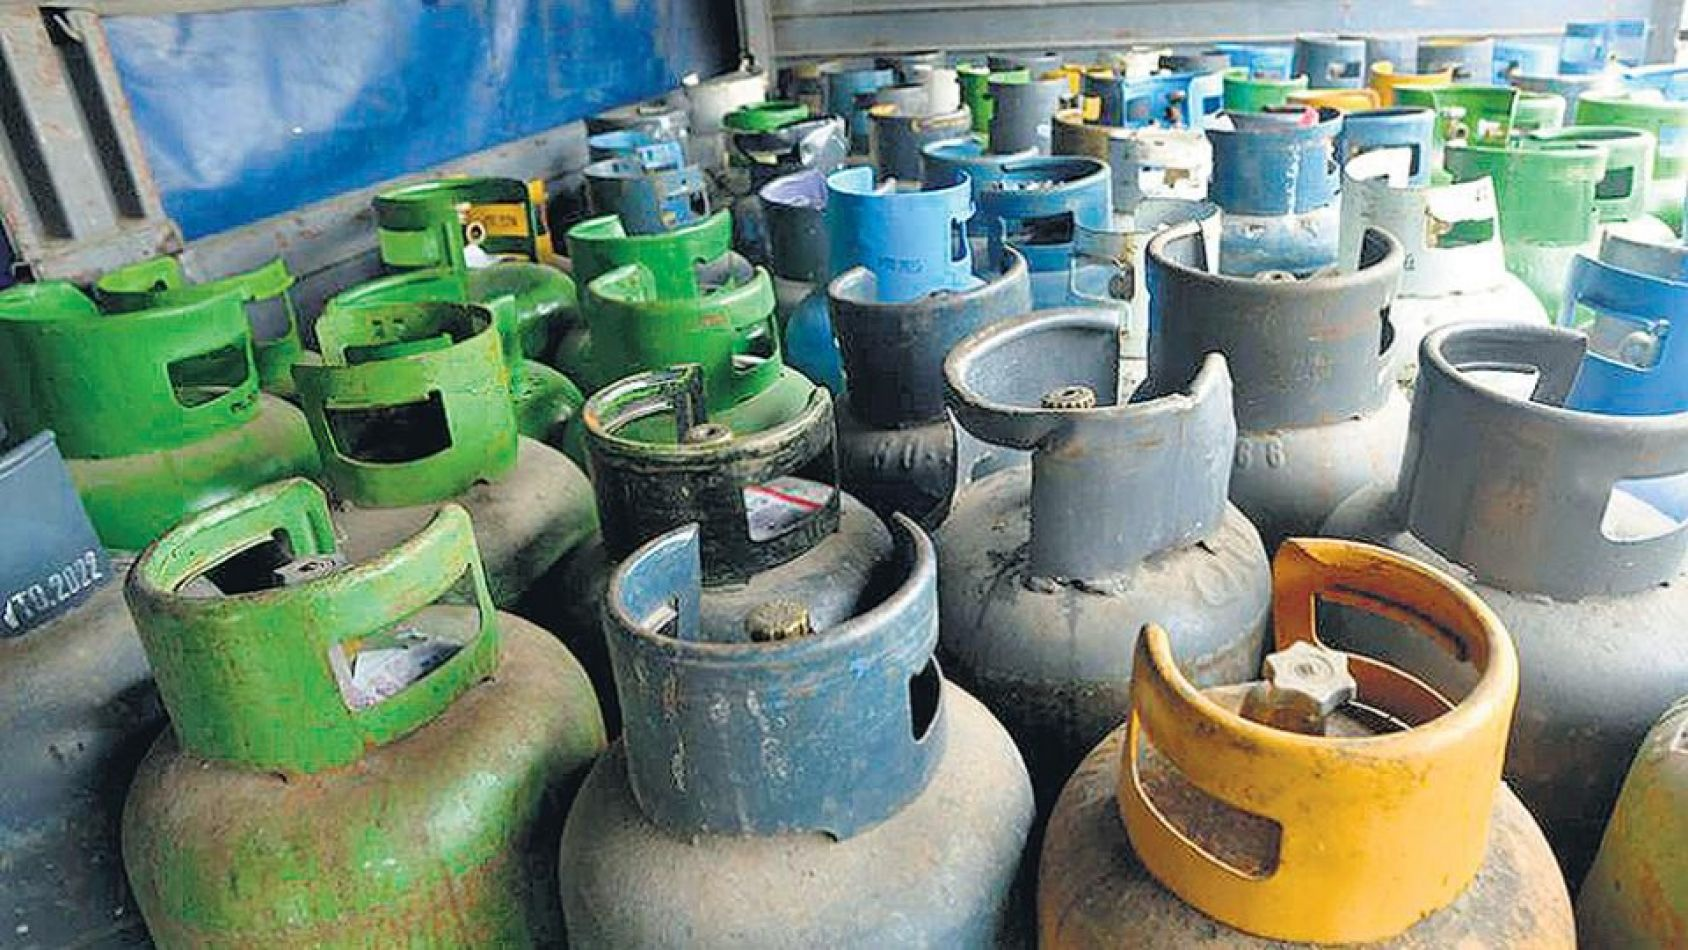 Tarjeta Social: Gobierno incorporará carga extraordinaria de 90Kg de gas subsidiado